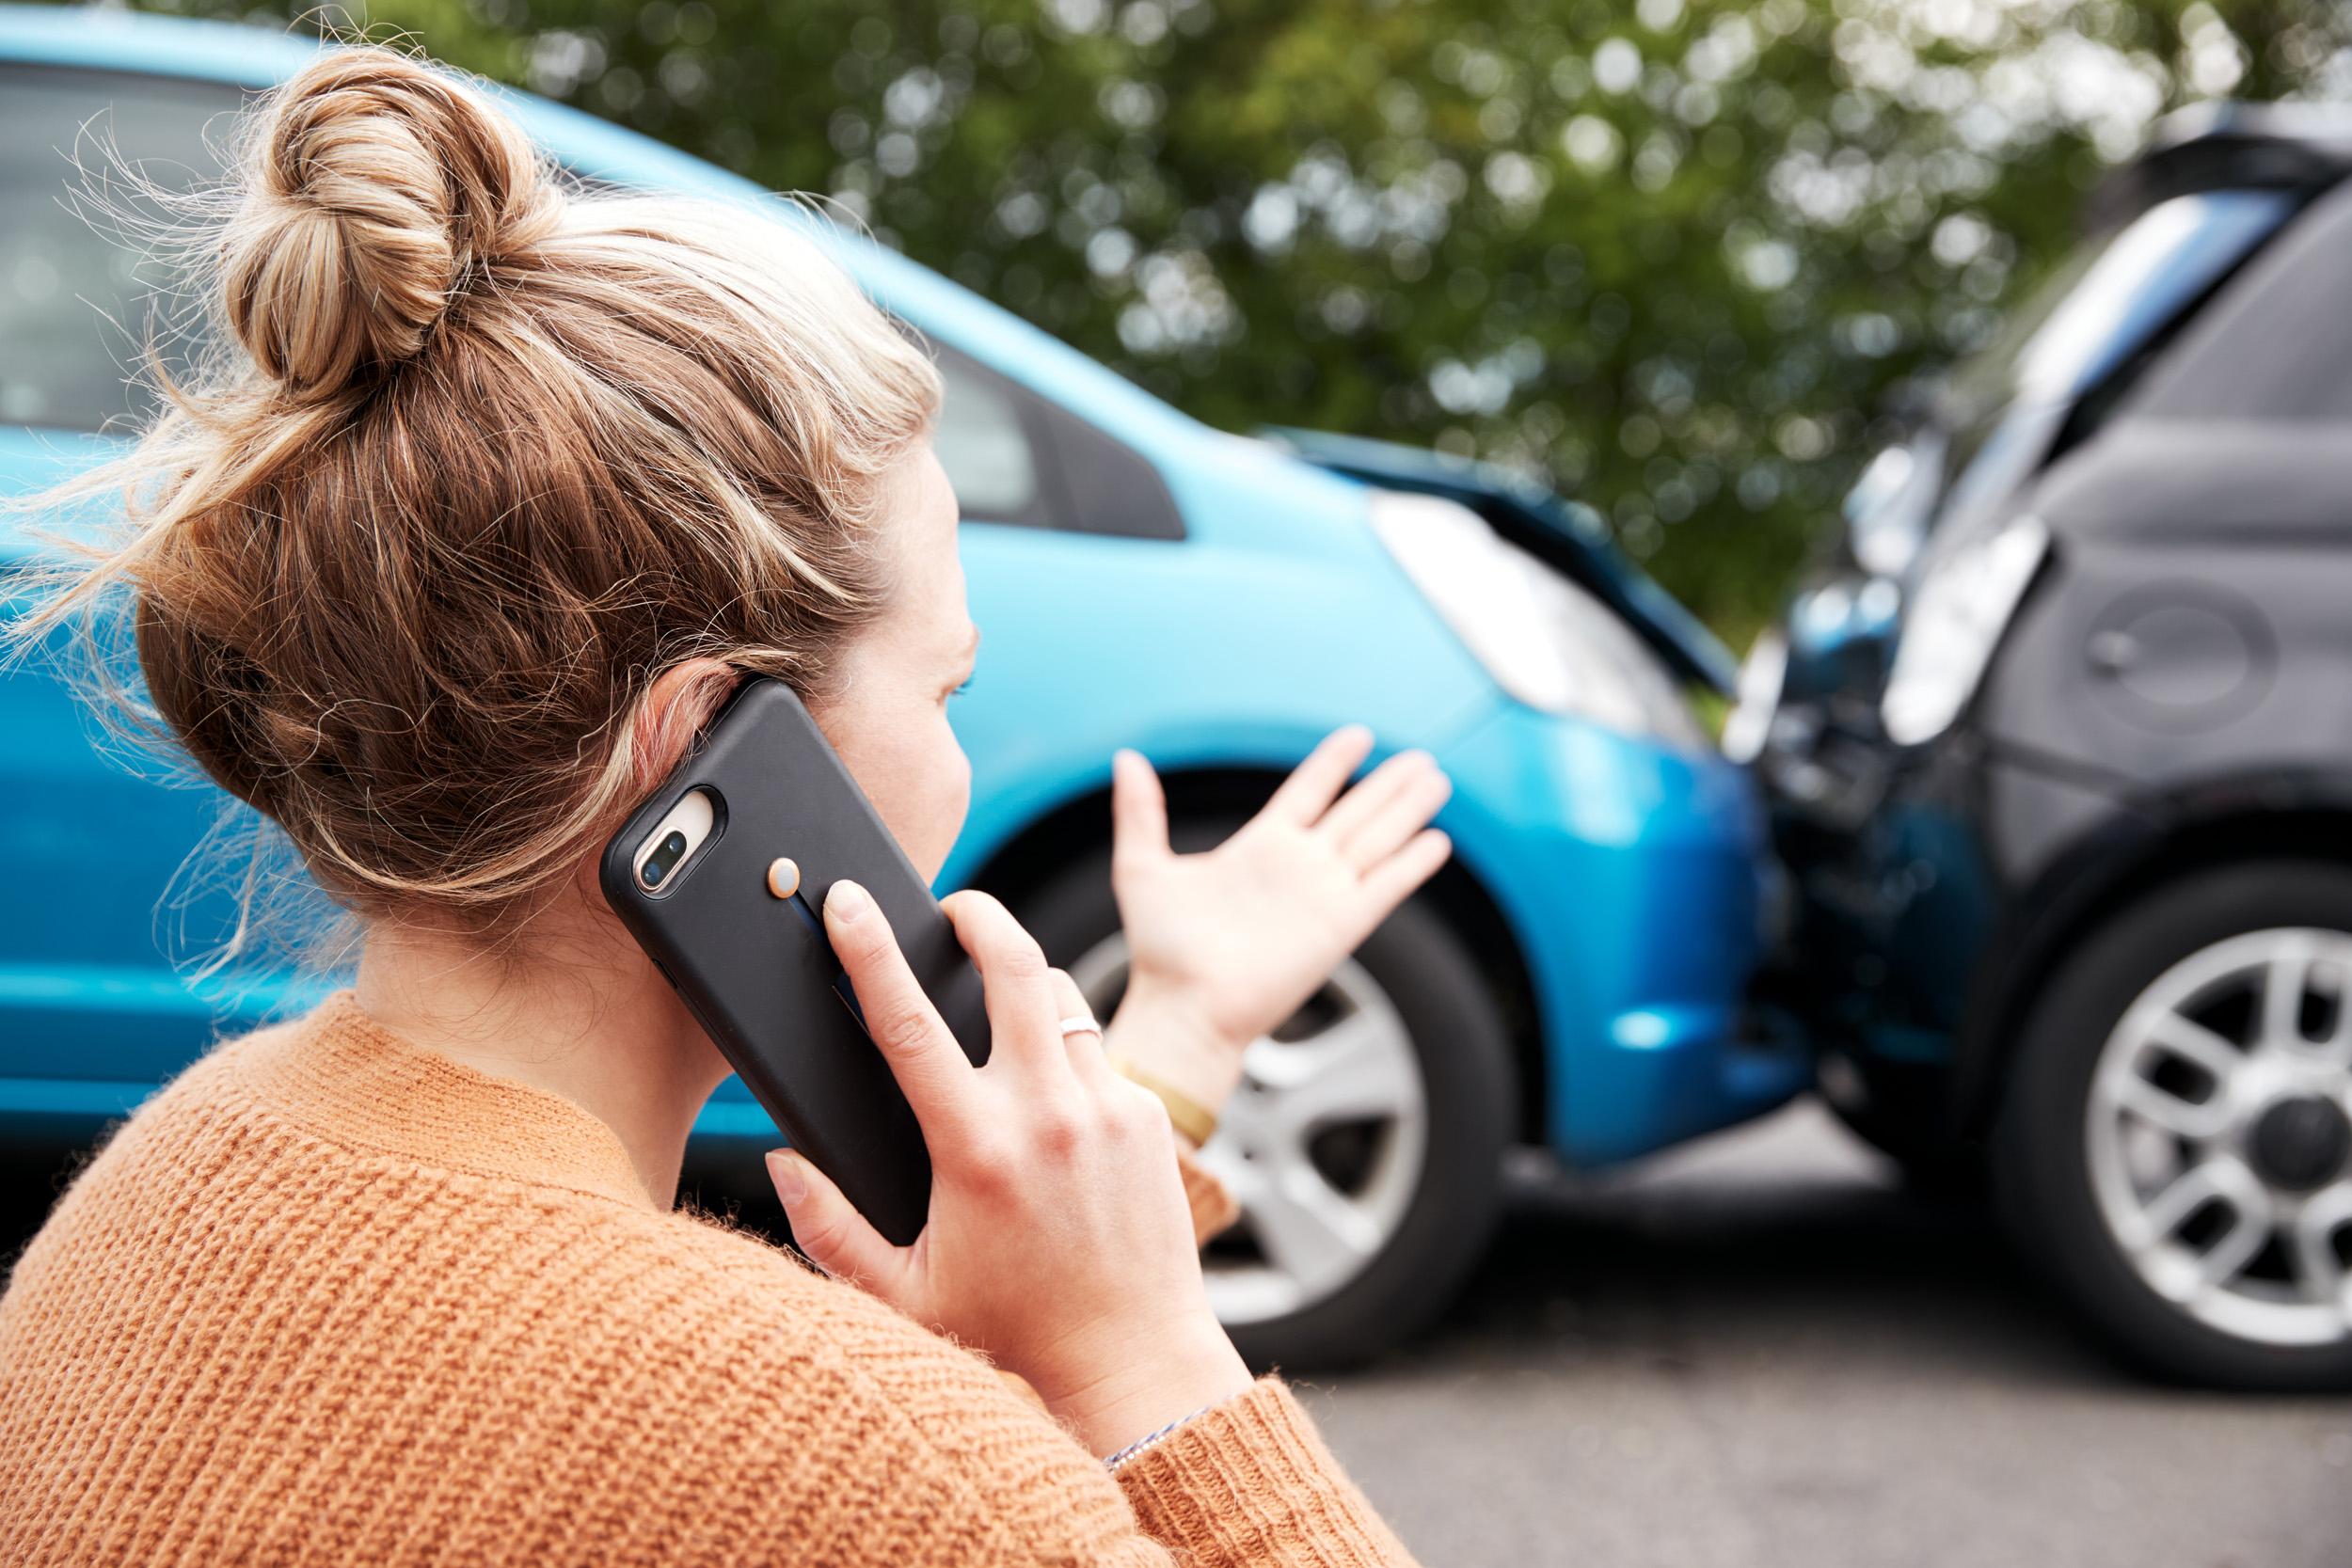 Female Motorist Involved In Car Accident